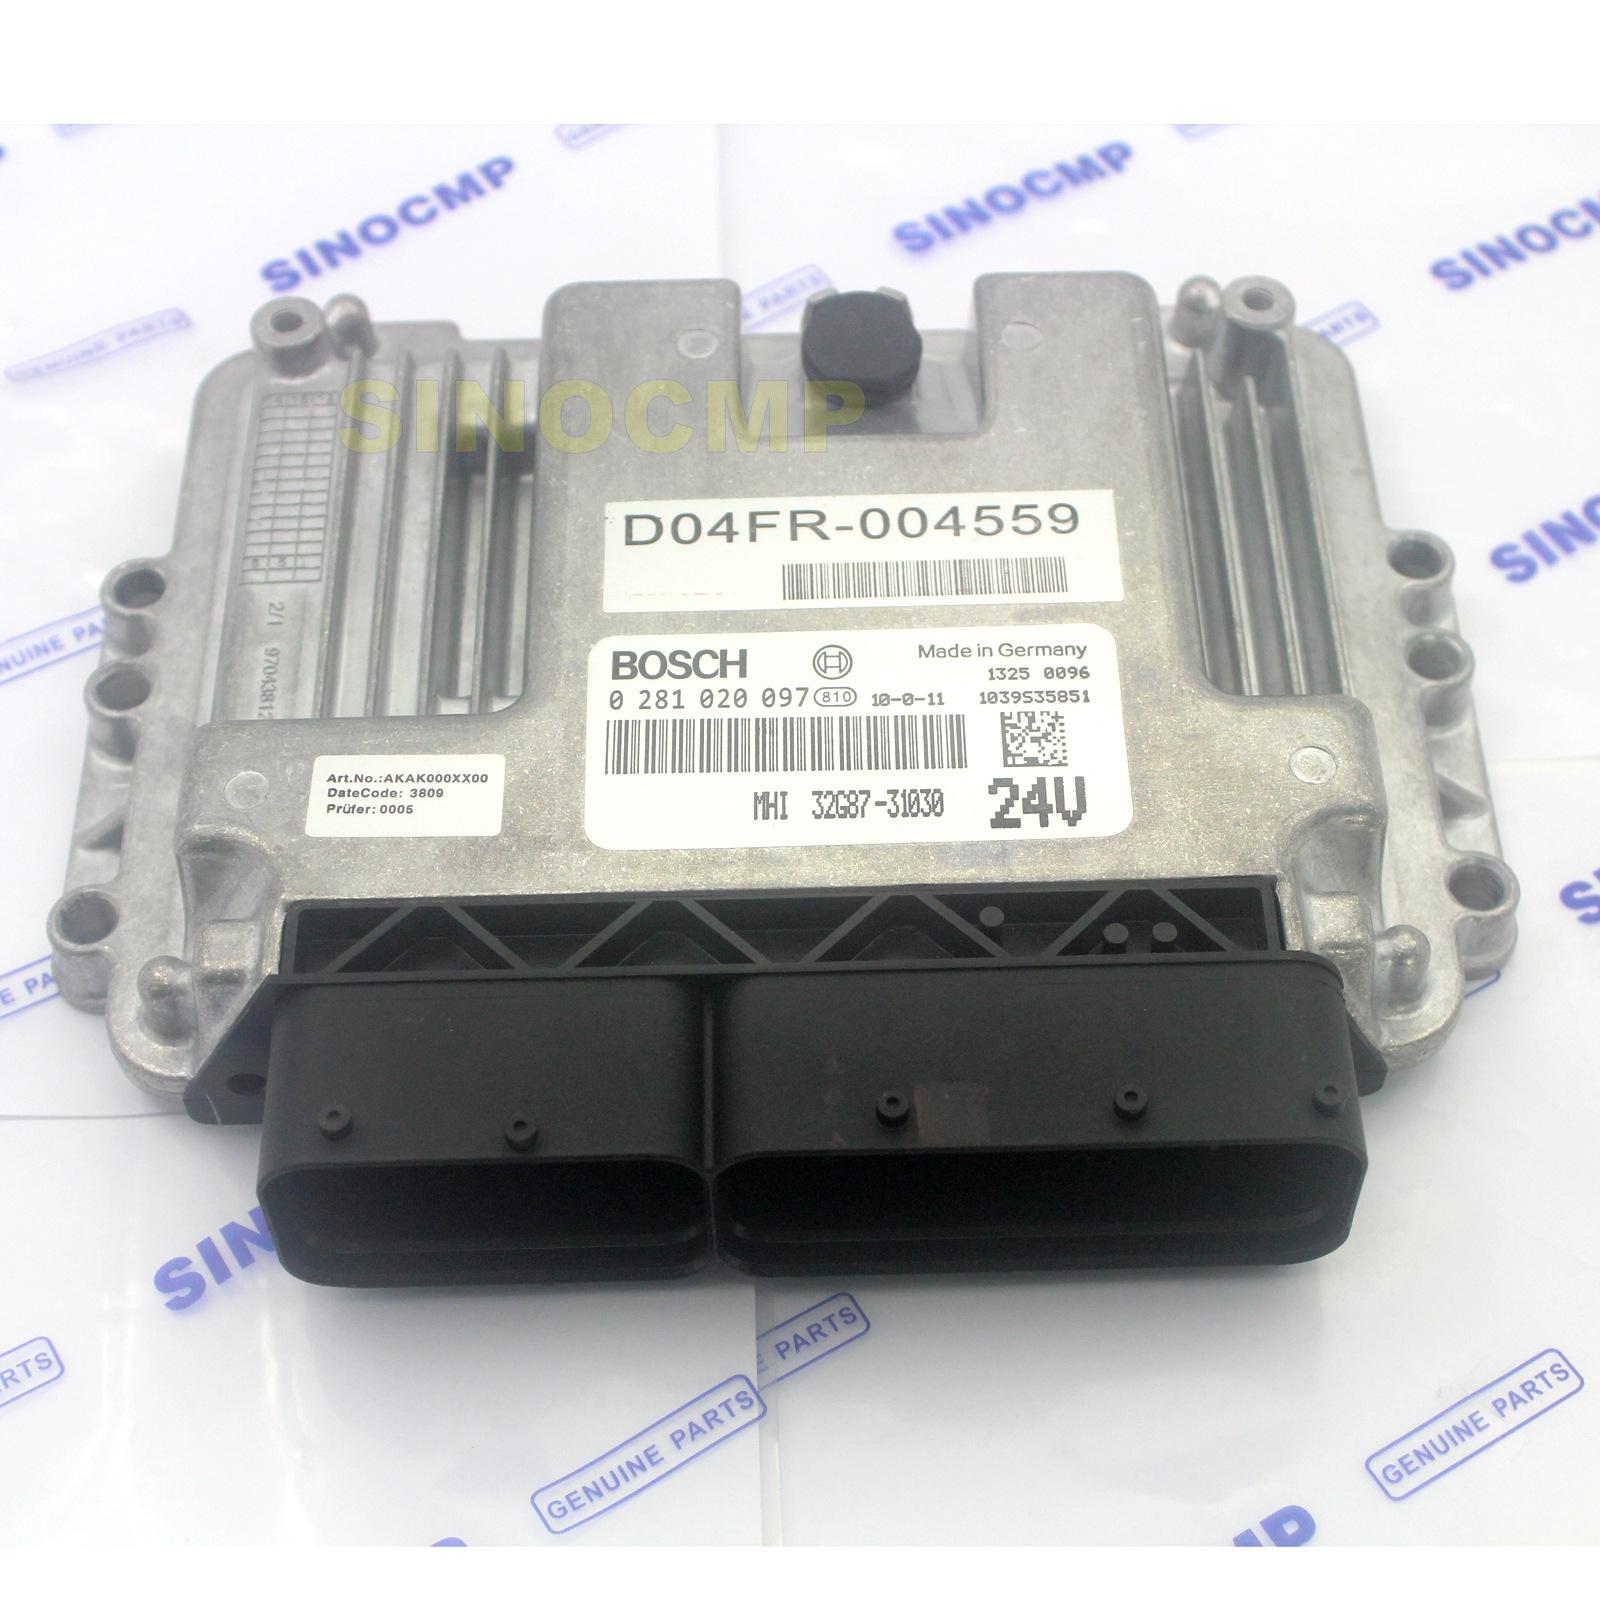 Controller 32g87 39840 For Kobelco Sk130 8 Sk135 Excavator Wiring Diagrams